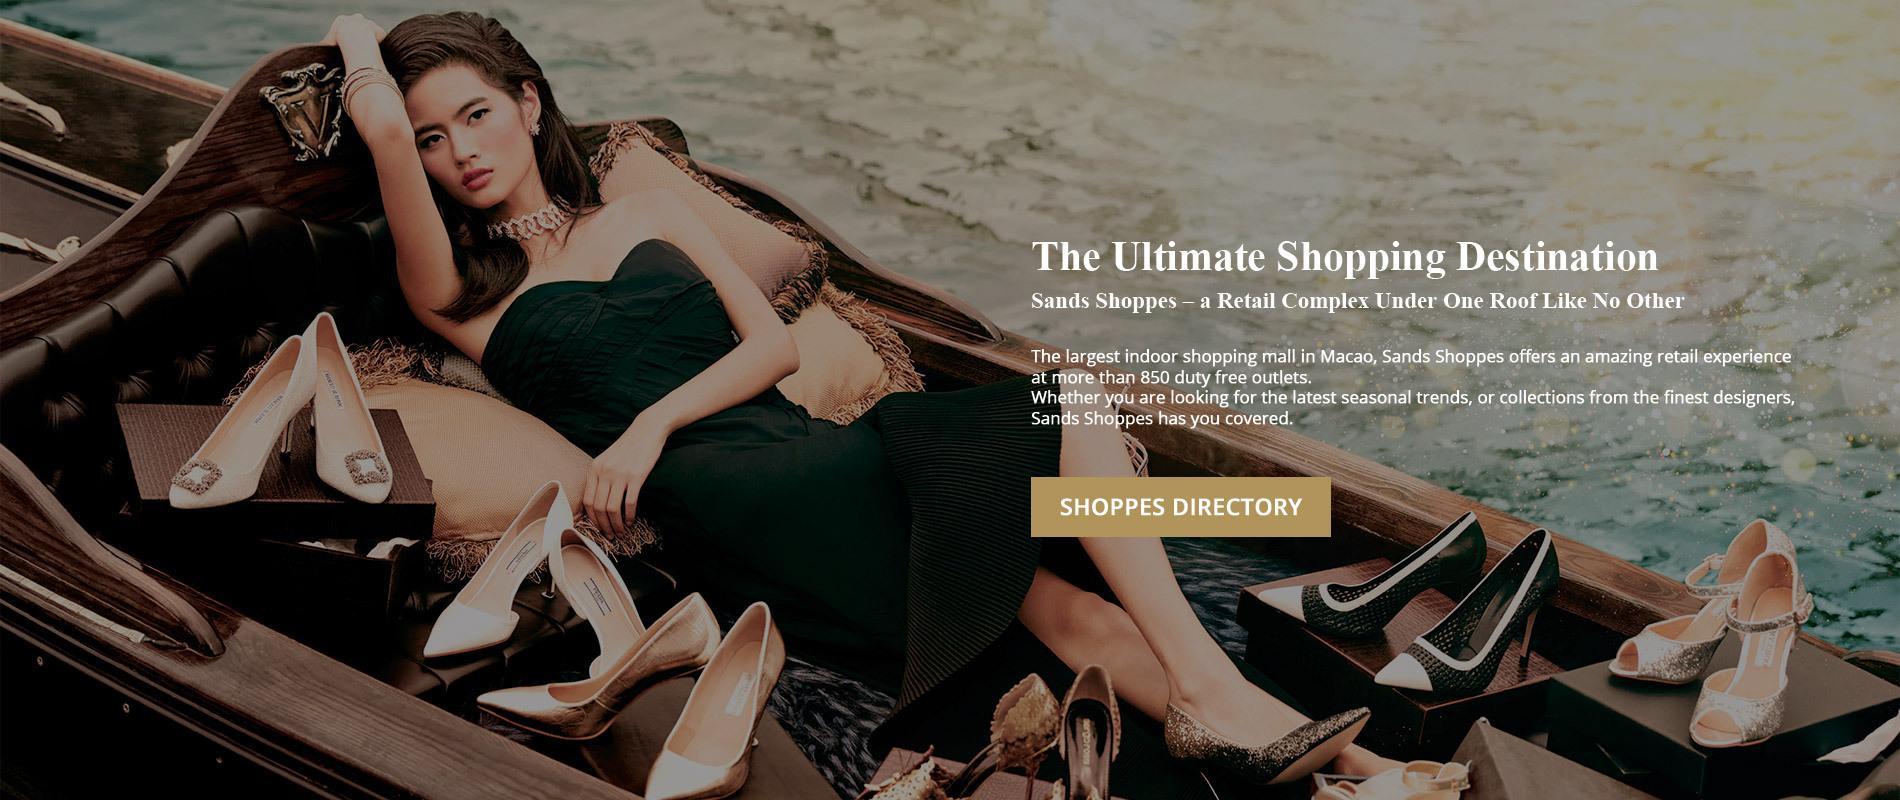 Shoppes at Venetian - Shoppes Directory